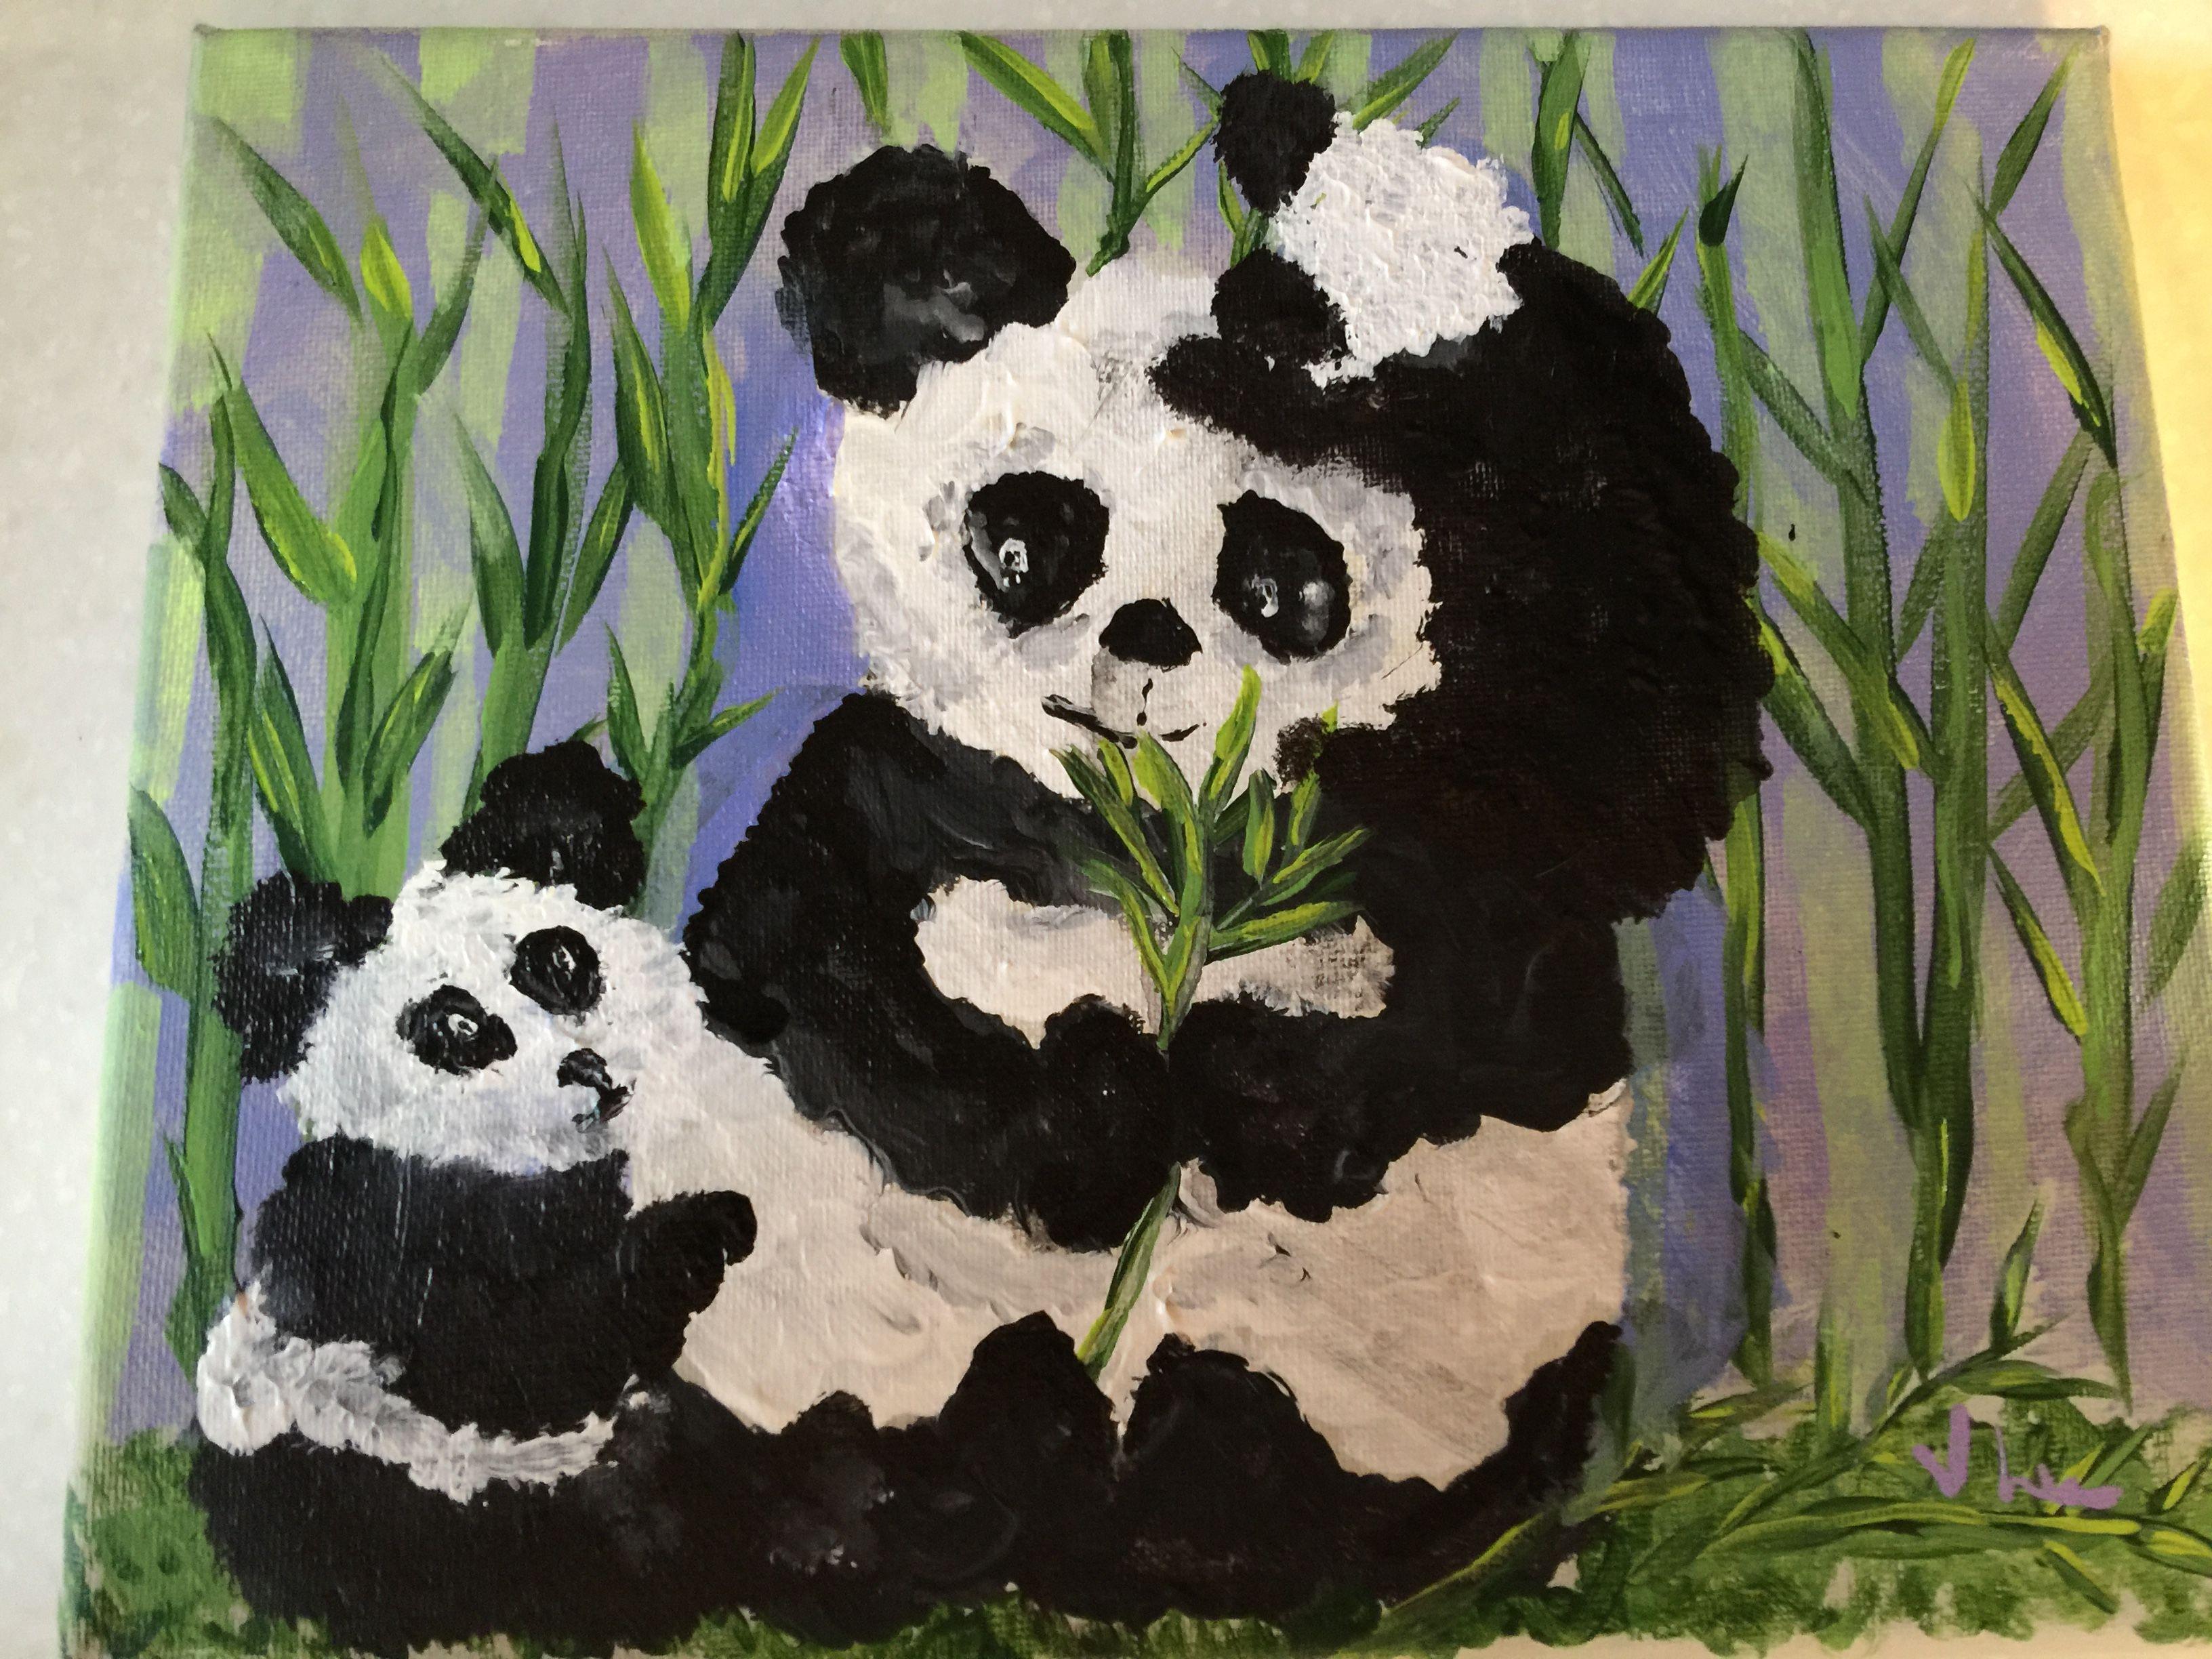 Mama panda and her babies